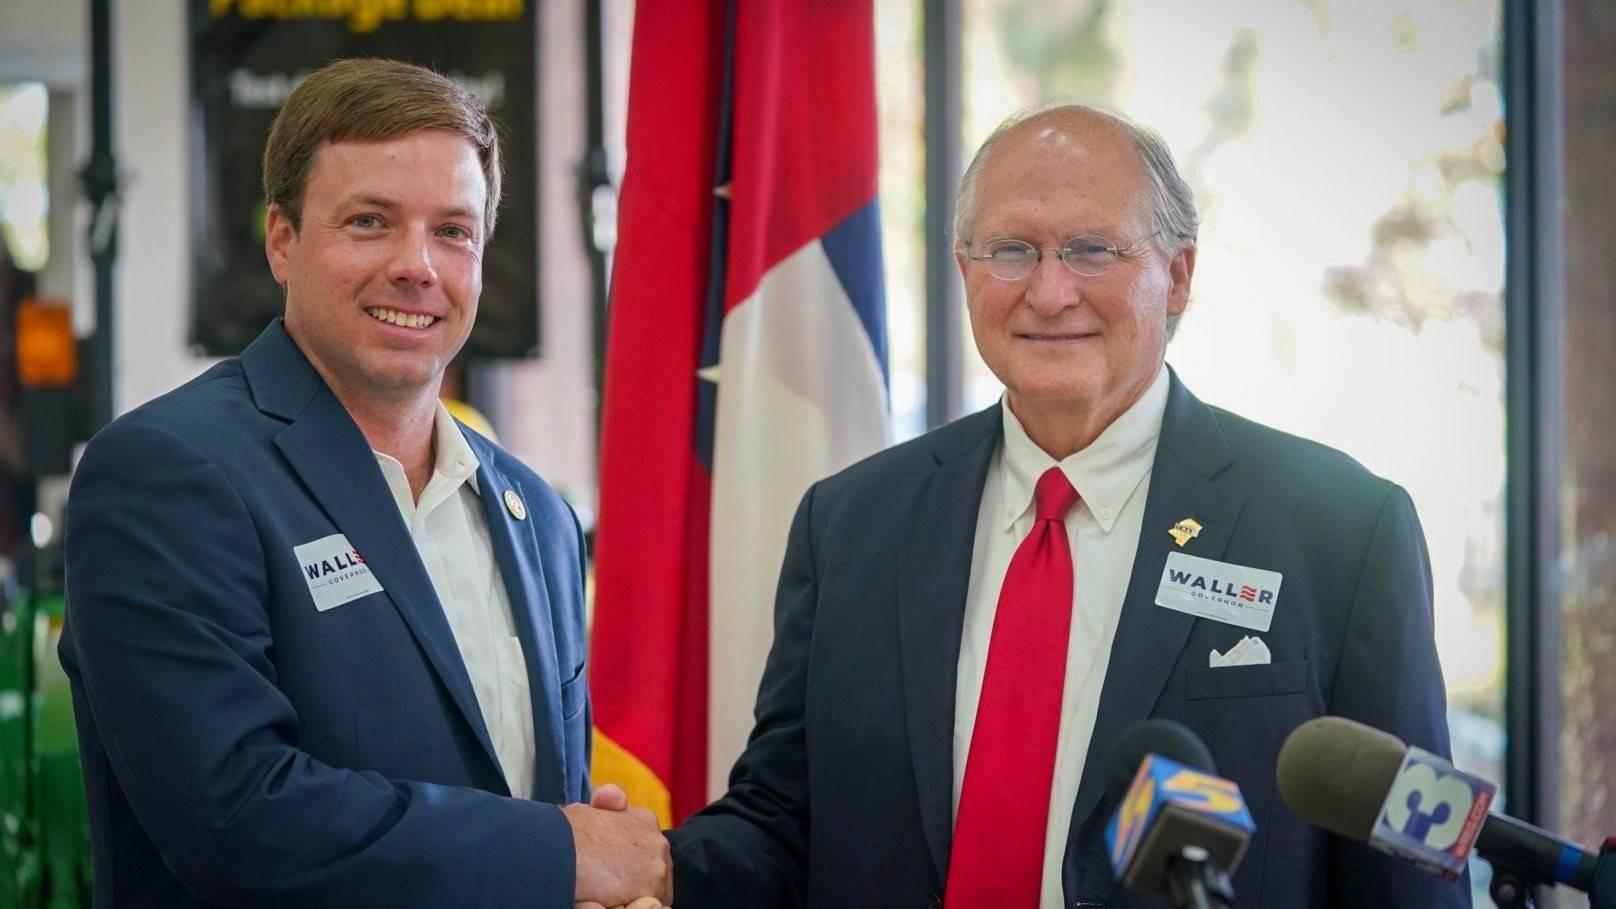 Foster backs Waller in GOP runoff for Mississippi governor